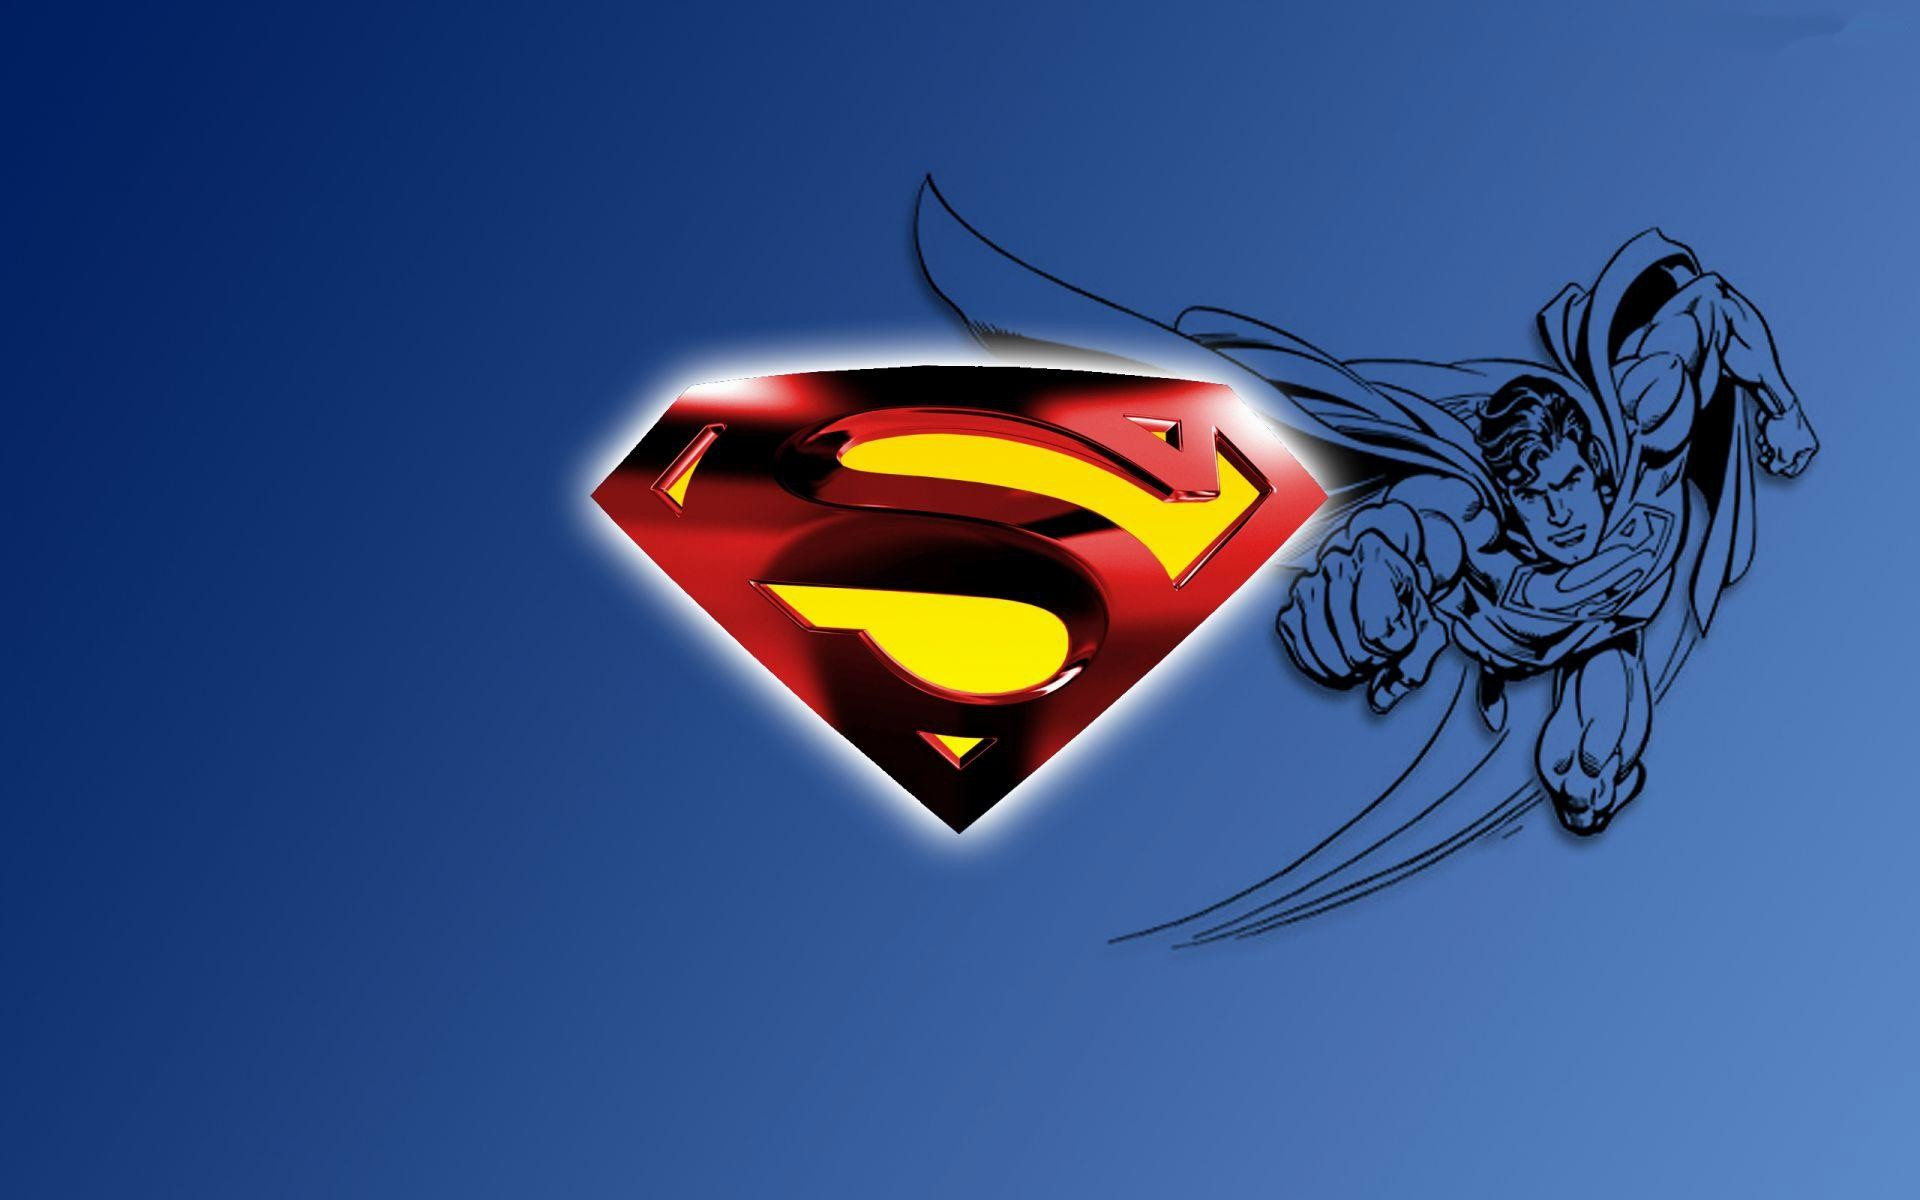 wallpaper.wiki-Superman-Logo-Ipad-Images-PIC-WPE00692